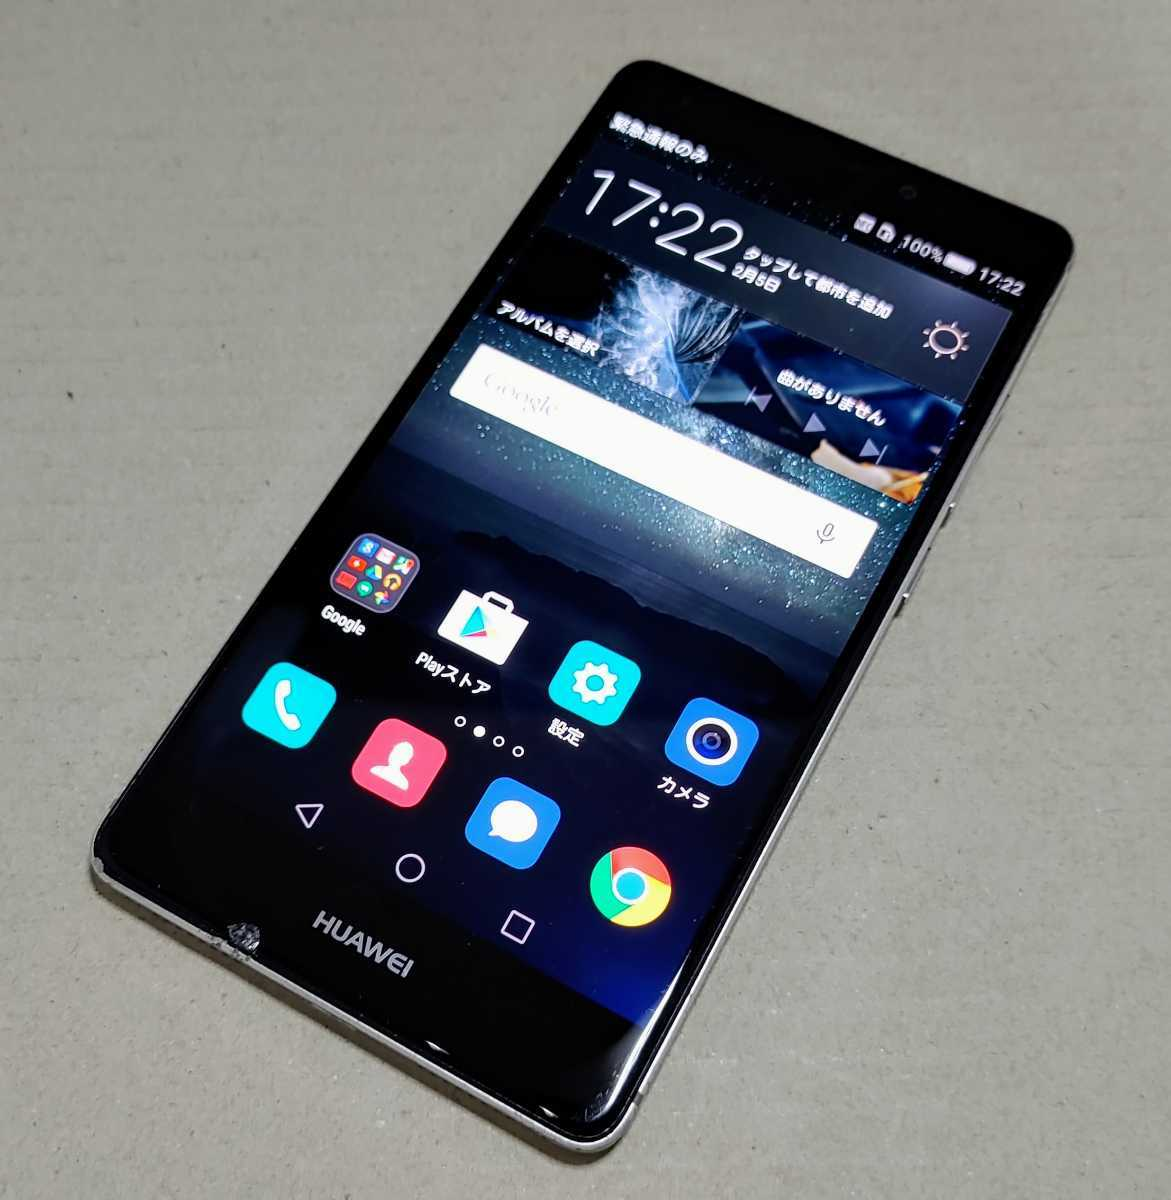 SIMフリースマートフォン HUAWEI Mate S 中古品 難あり品 動作可 Androidバージョン5.1.1 送料198円~ 各種発送対応 ファーウェイ CRR-L09_画像1